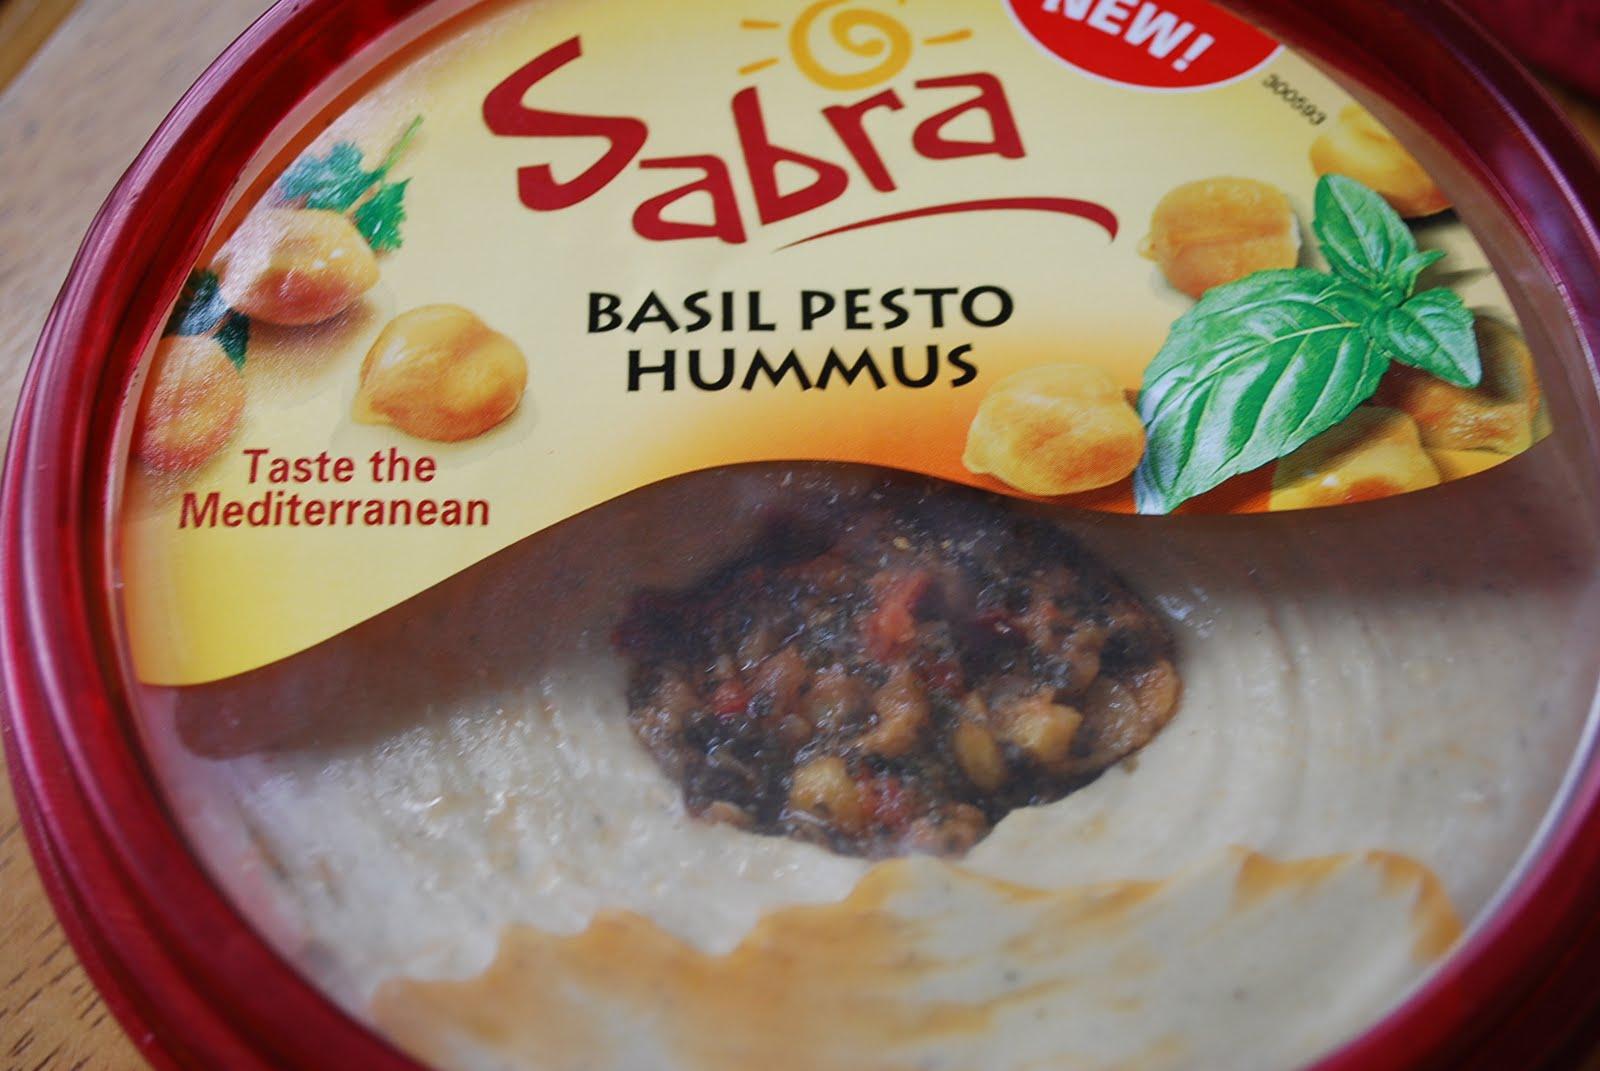 great snack...Hummus stuffed egg whites - Amee's Savory Dish